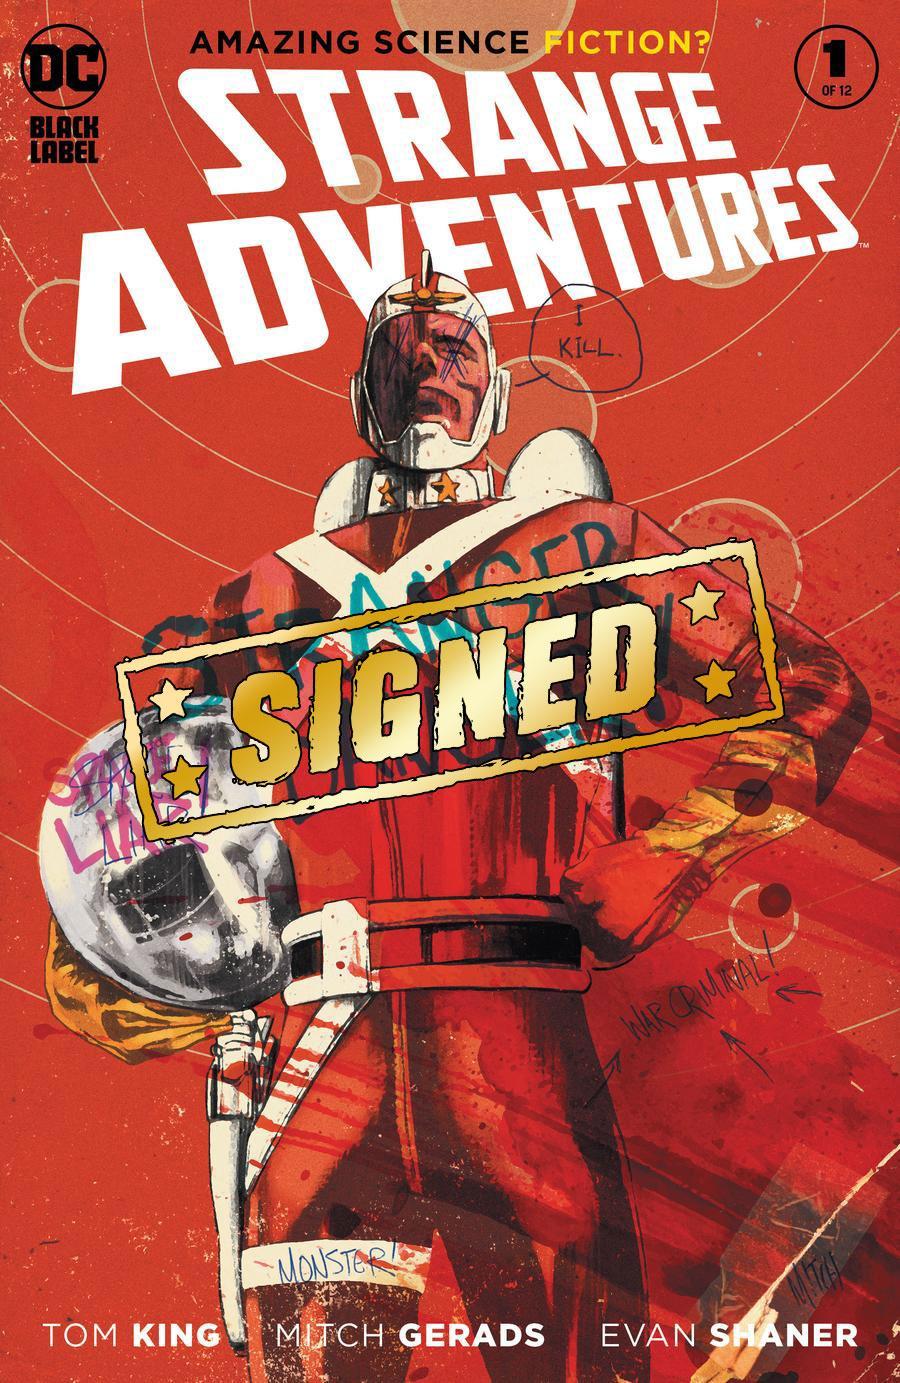 Strange Adventures Vol 4 #1 Cover E Regular Mitch Gerads Cover Signed By Tom King